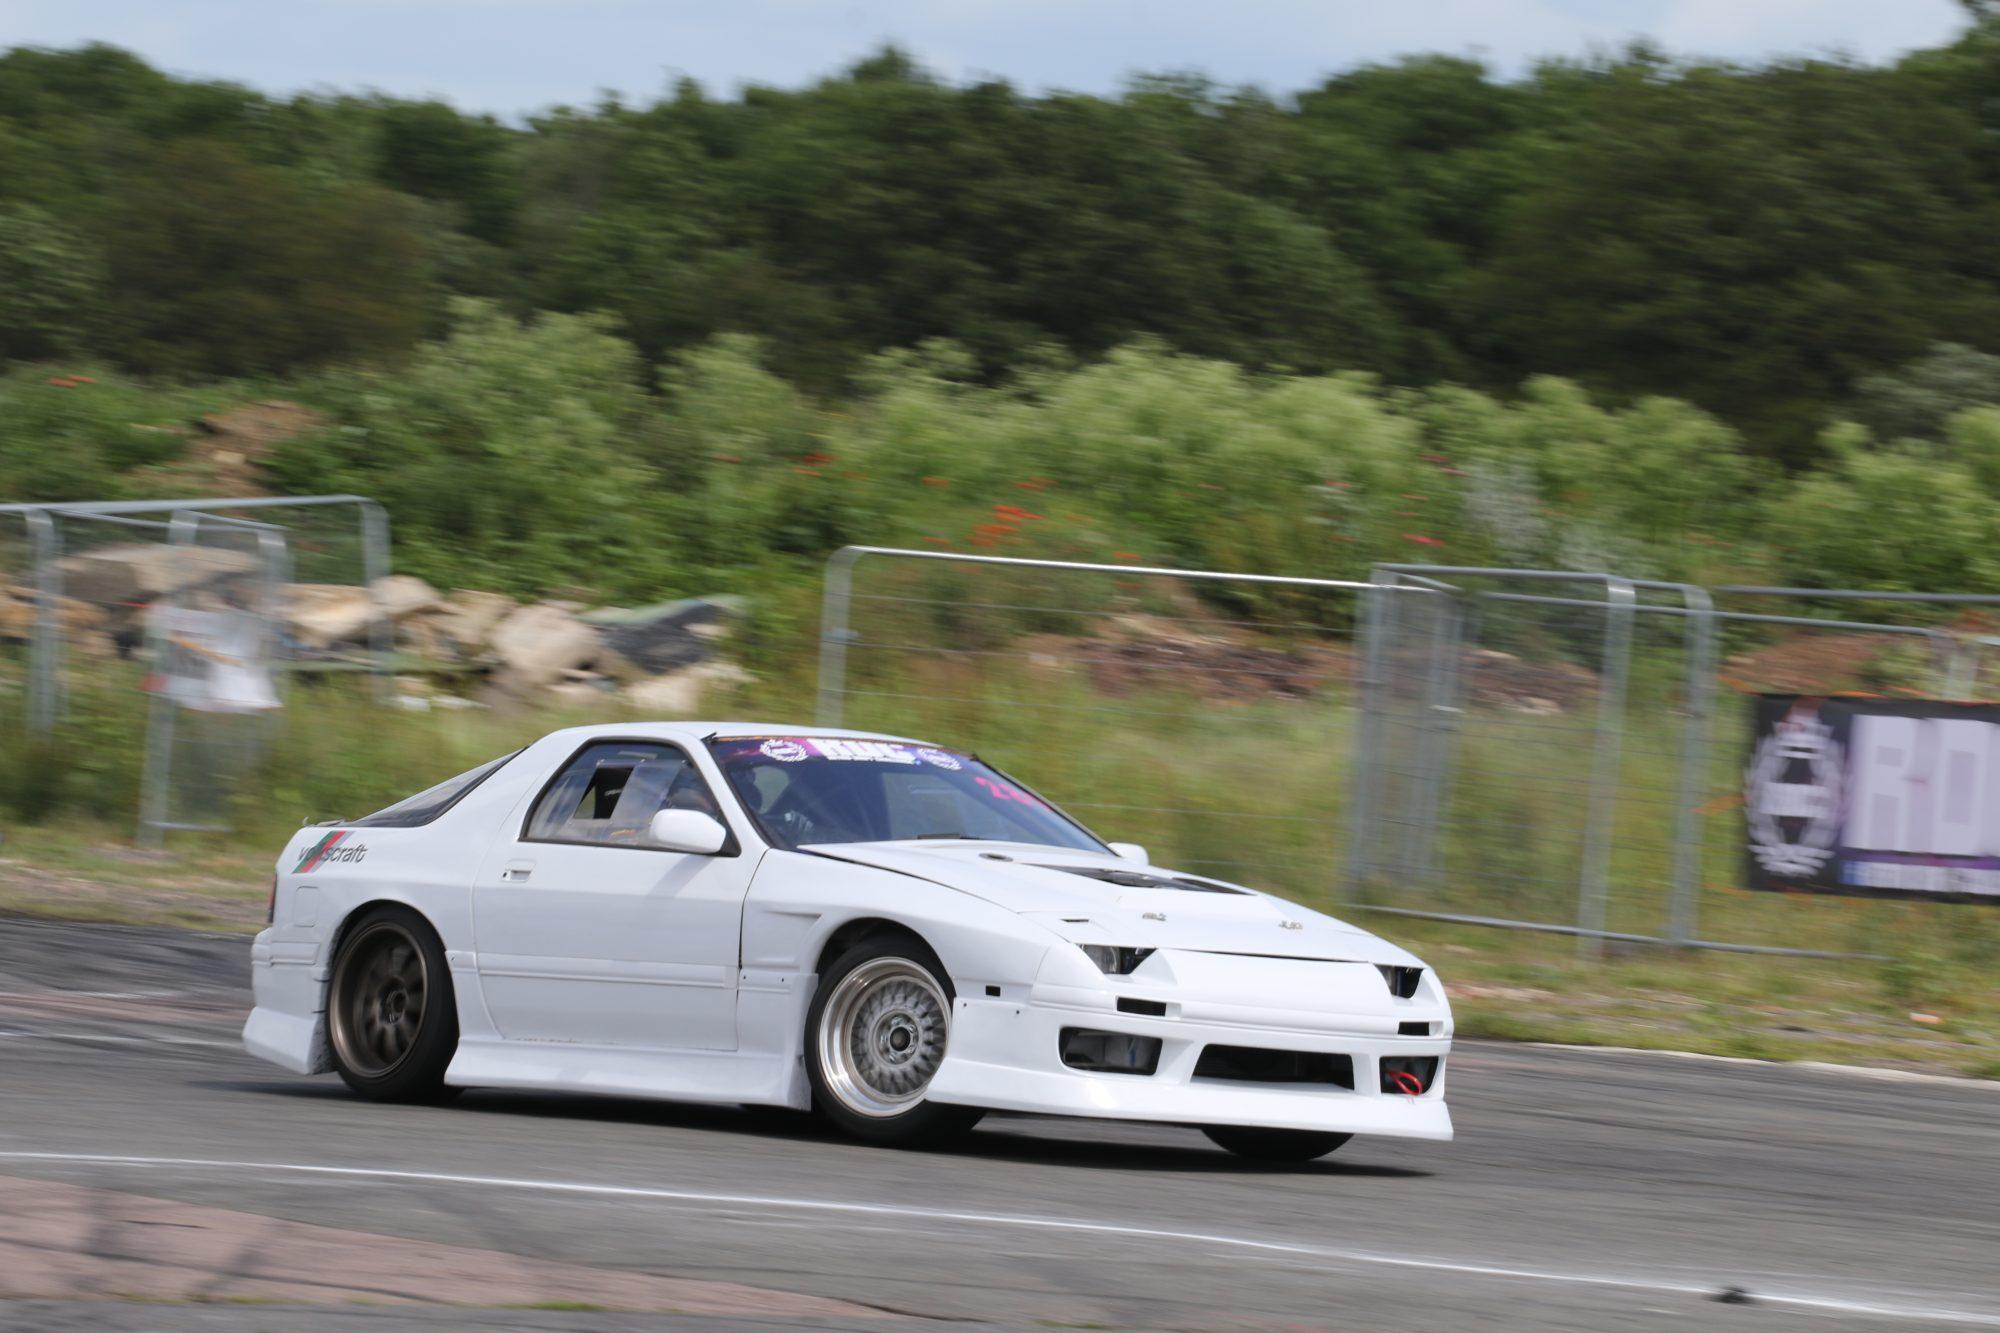 Retro Show, Retro cars, motoring, automotive, car show, car meet, classic car, Mazda RX7